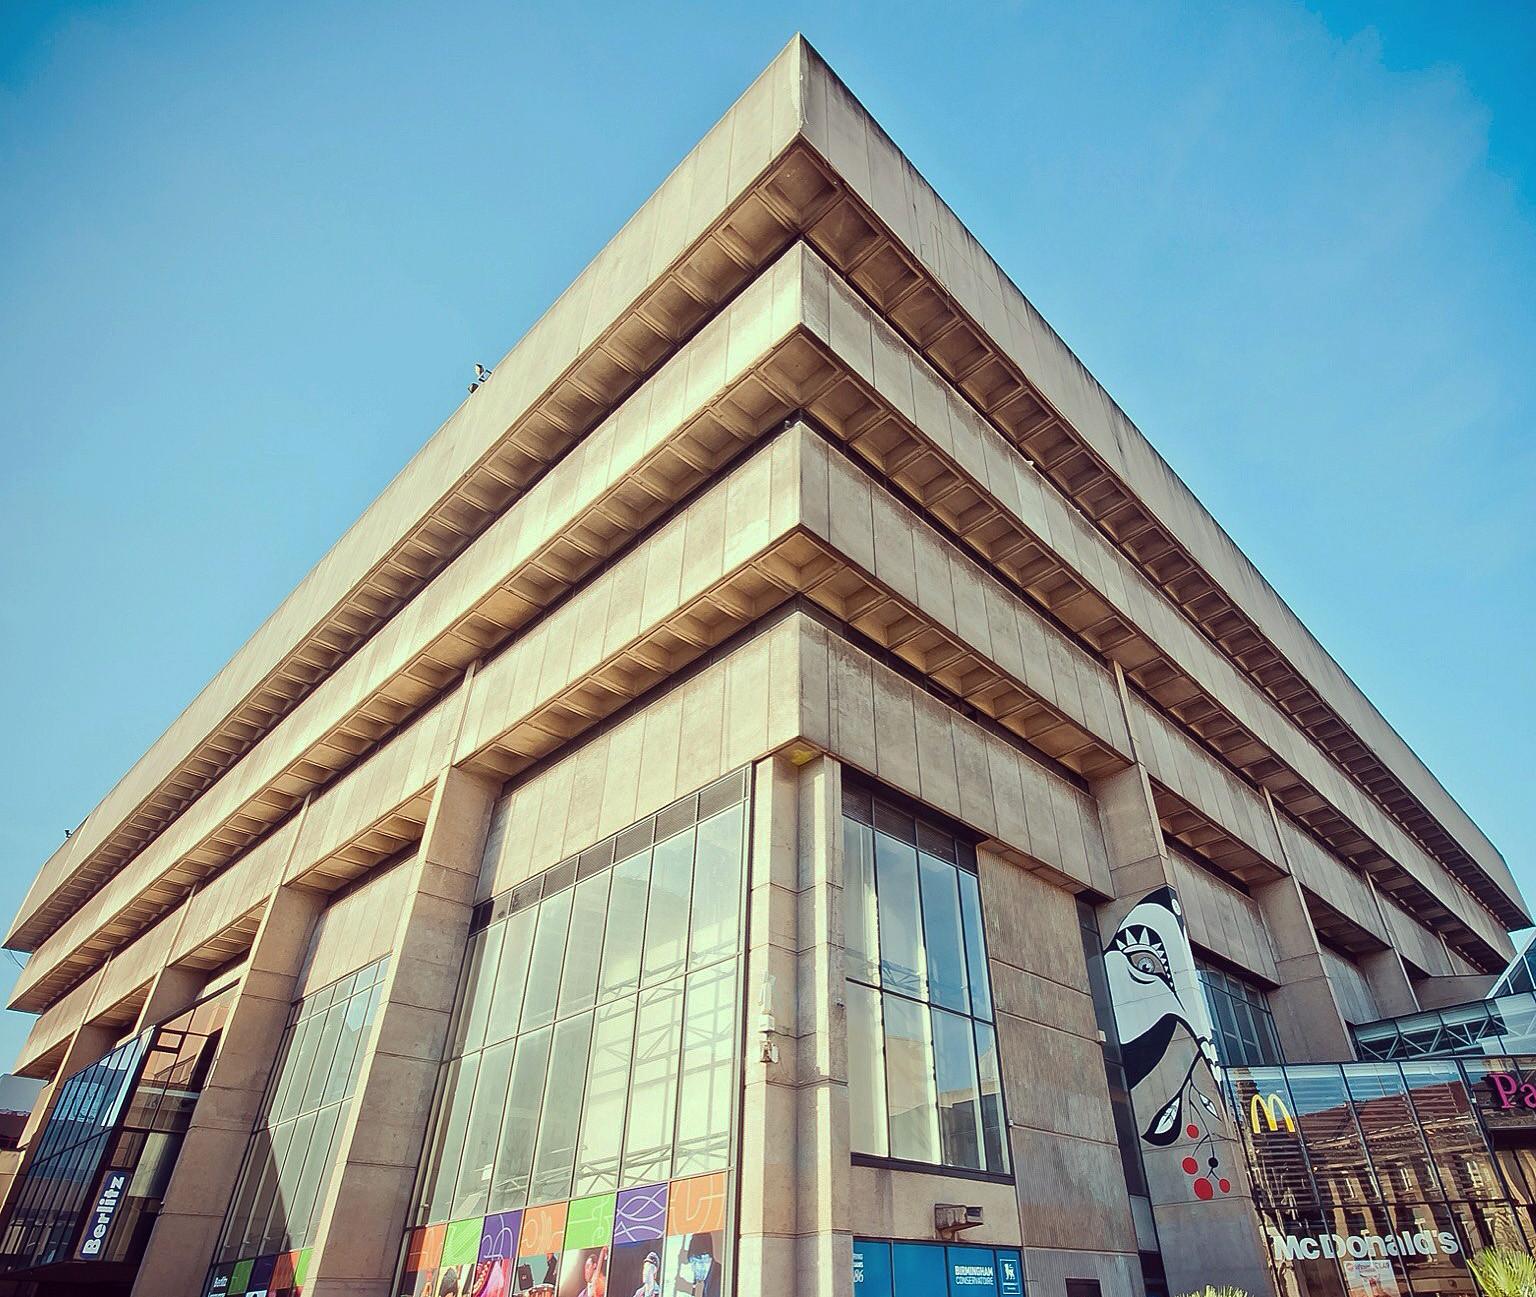 Demolition Begins On John Madin's Brutalist Former Library in Birmingham, The former library